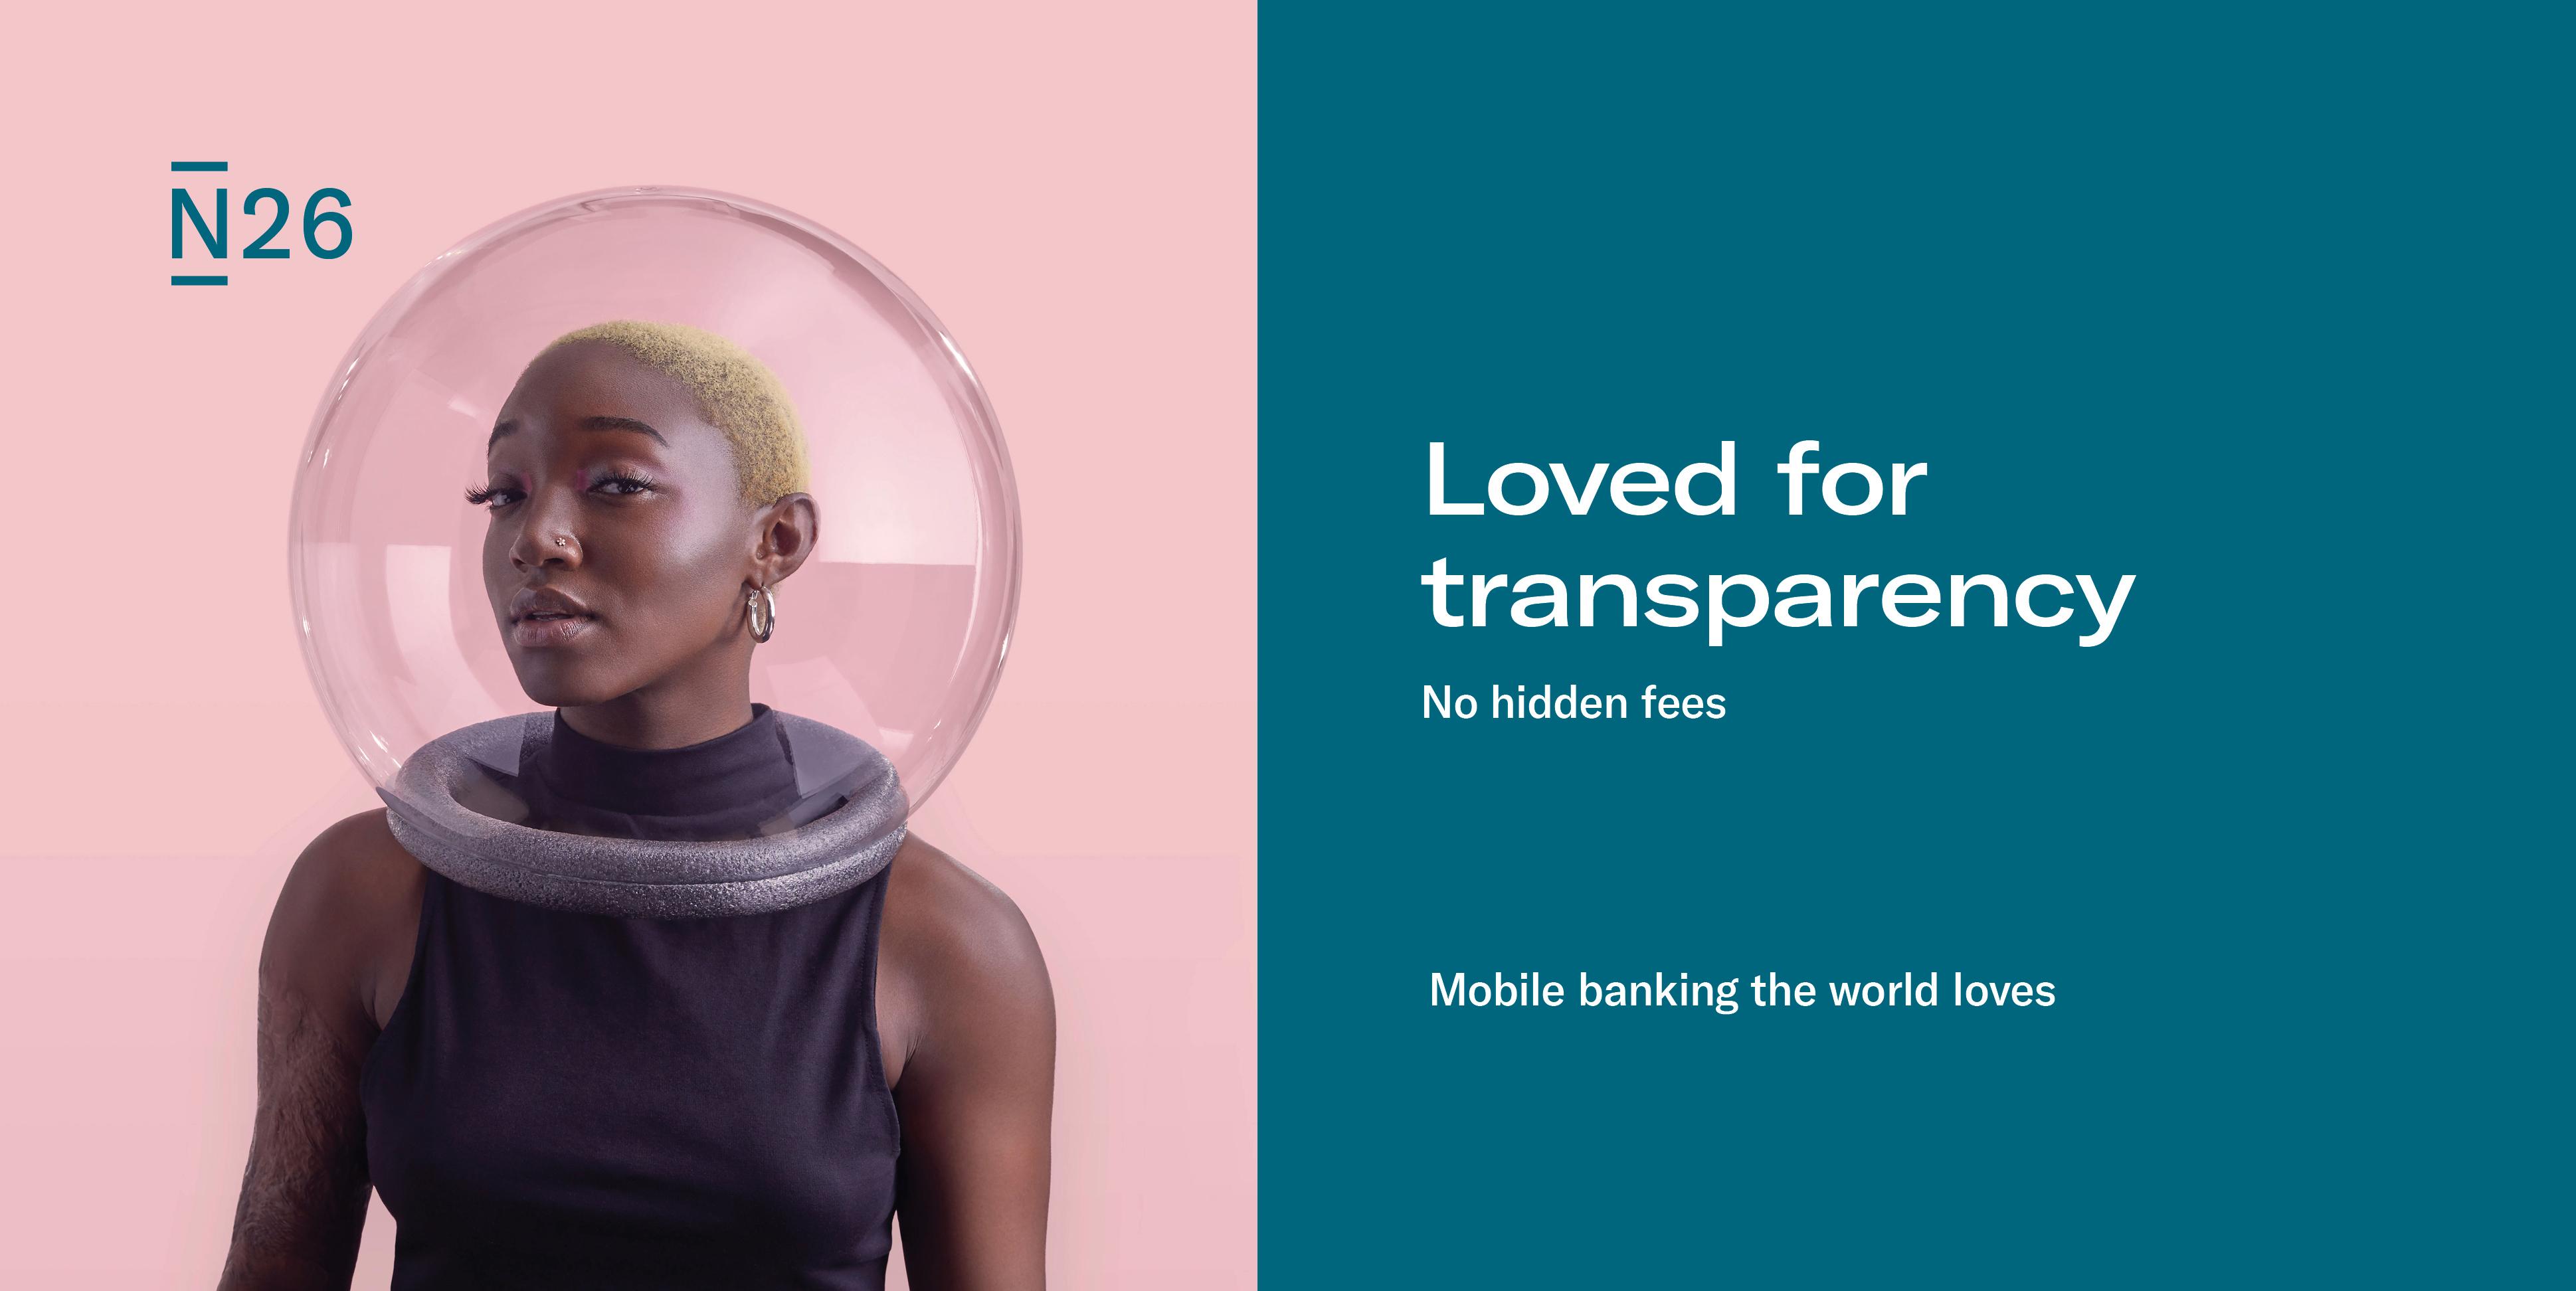 N26 Mobile Banking The World Loves